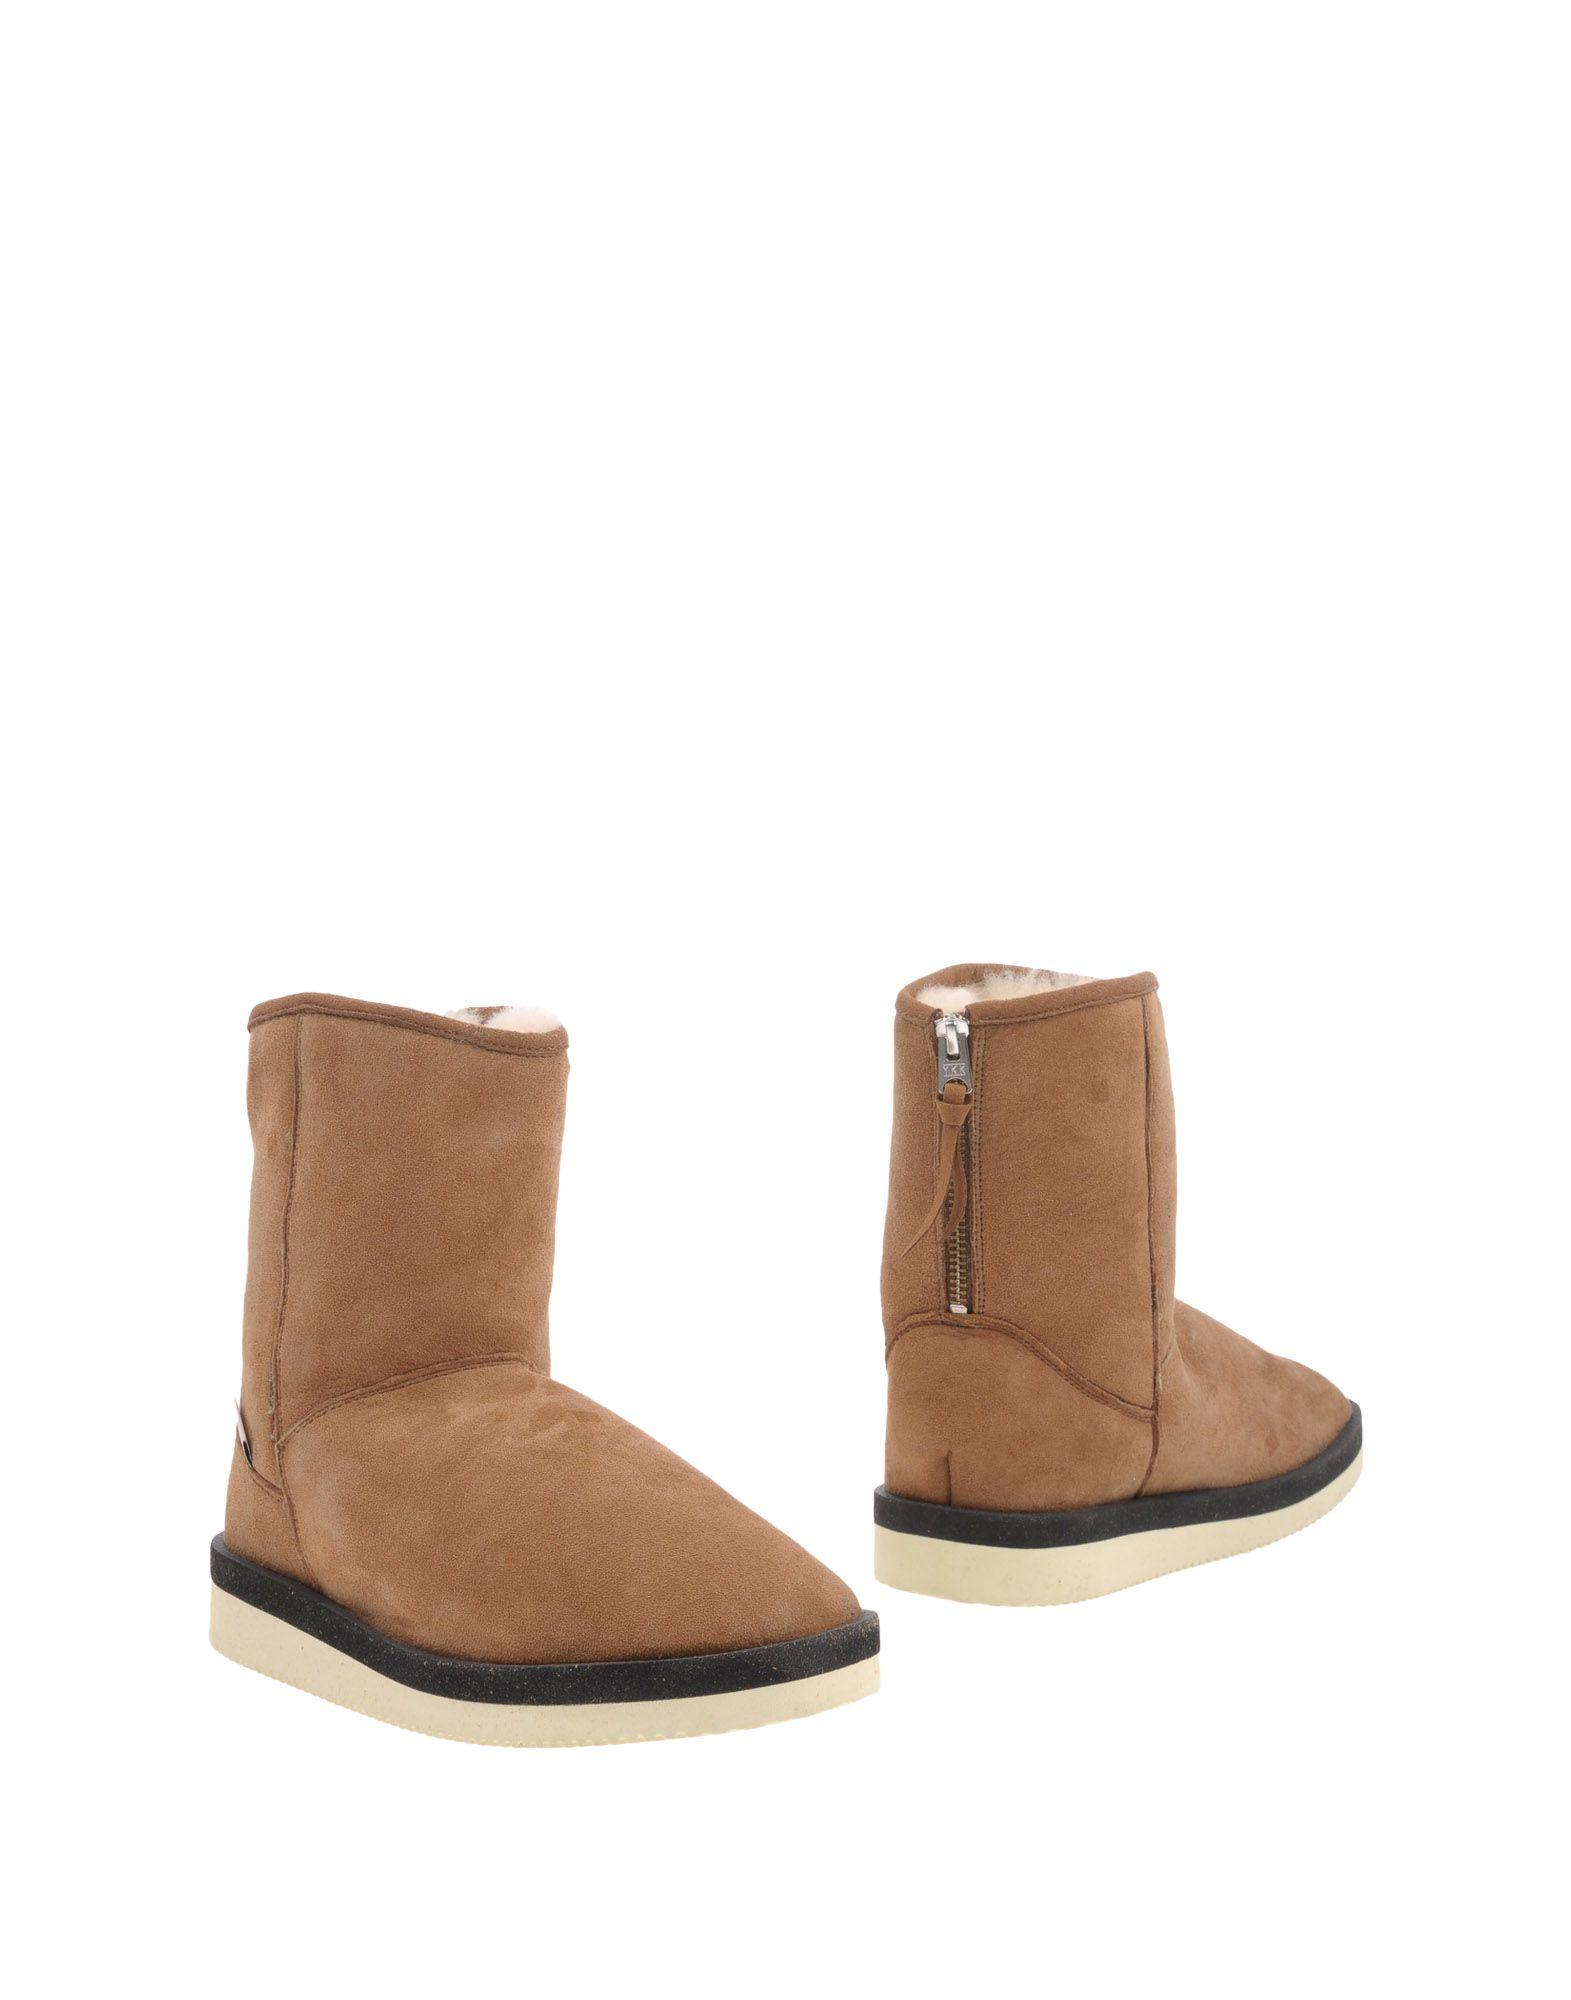 Suicoke Stiefelette Damen  11218363QO Gute Qualität beliebte Schuhe